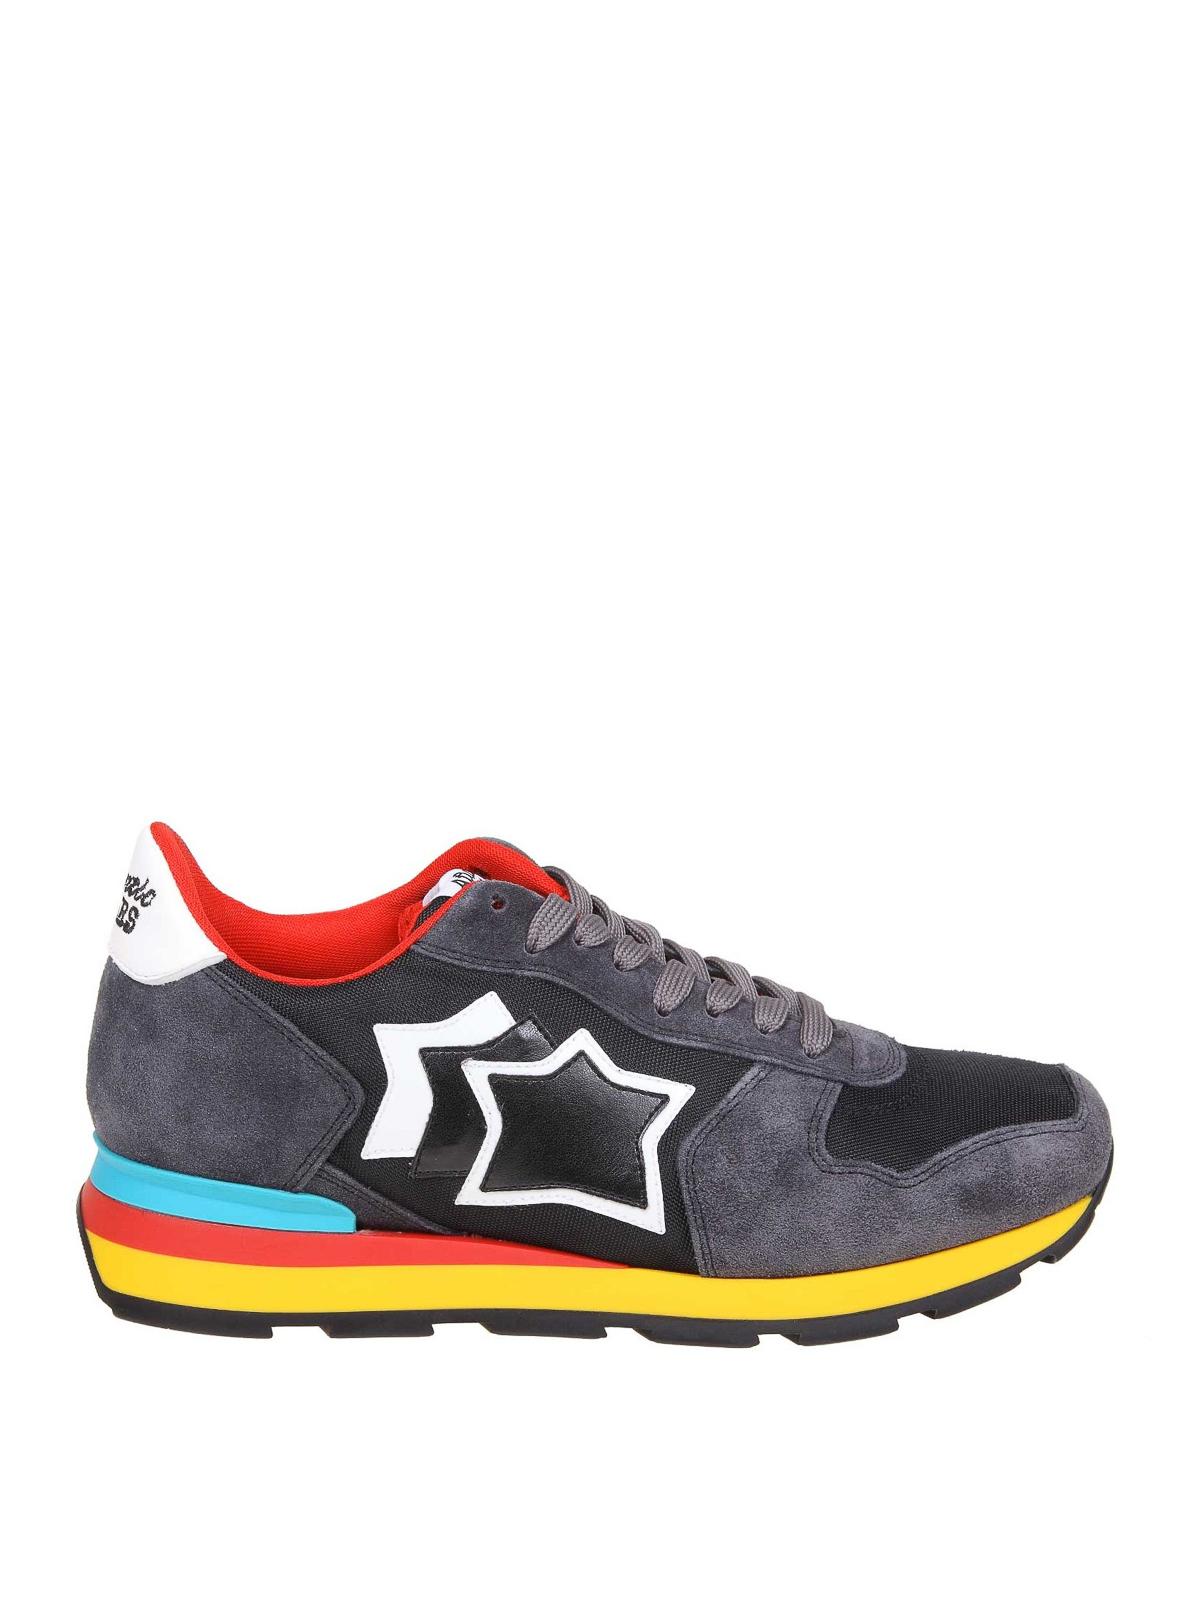 Pelle Stars E Grigie Ikrix Grigio Atlantic Nere Antares Sneaker eCroBdx